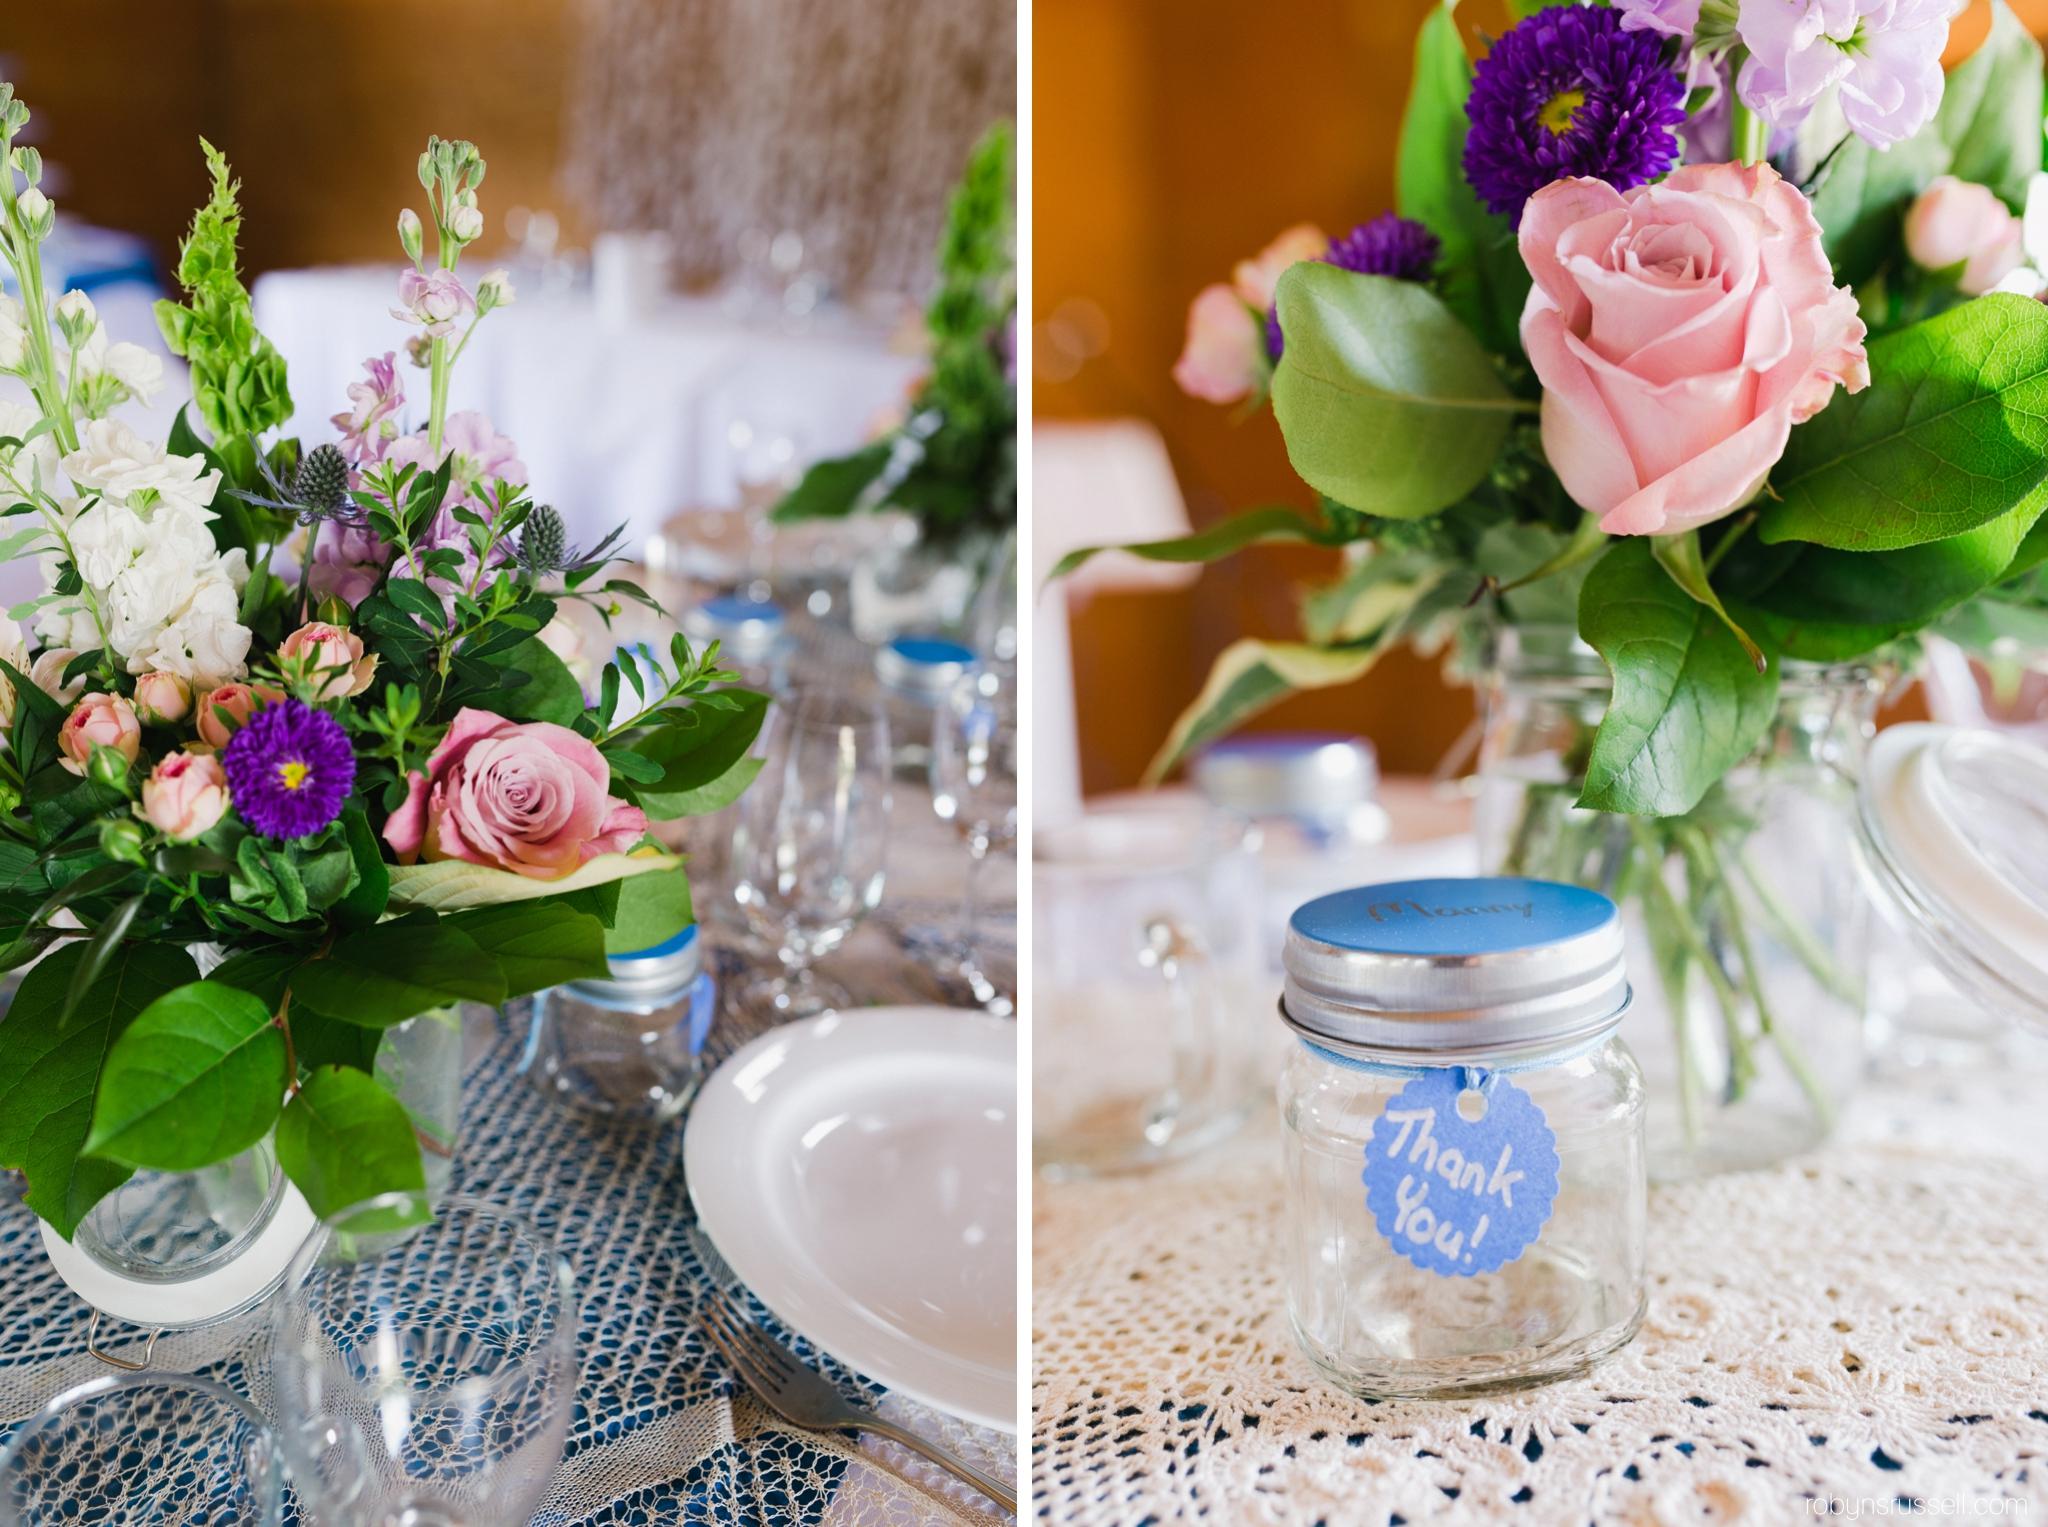 13-wedding-flowers-at-reception.jpg